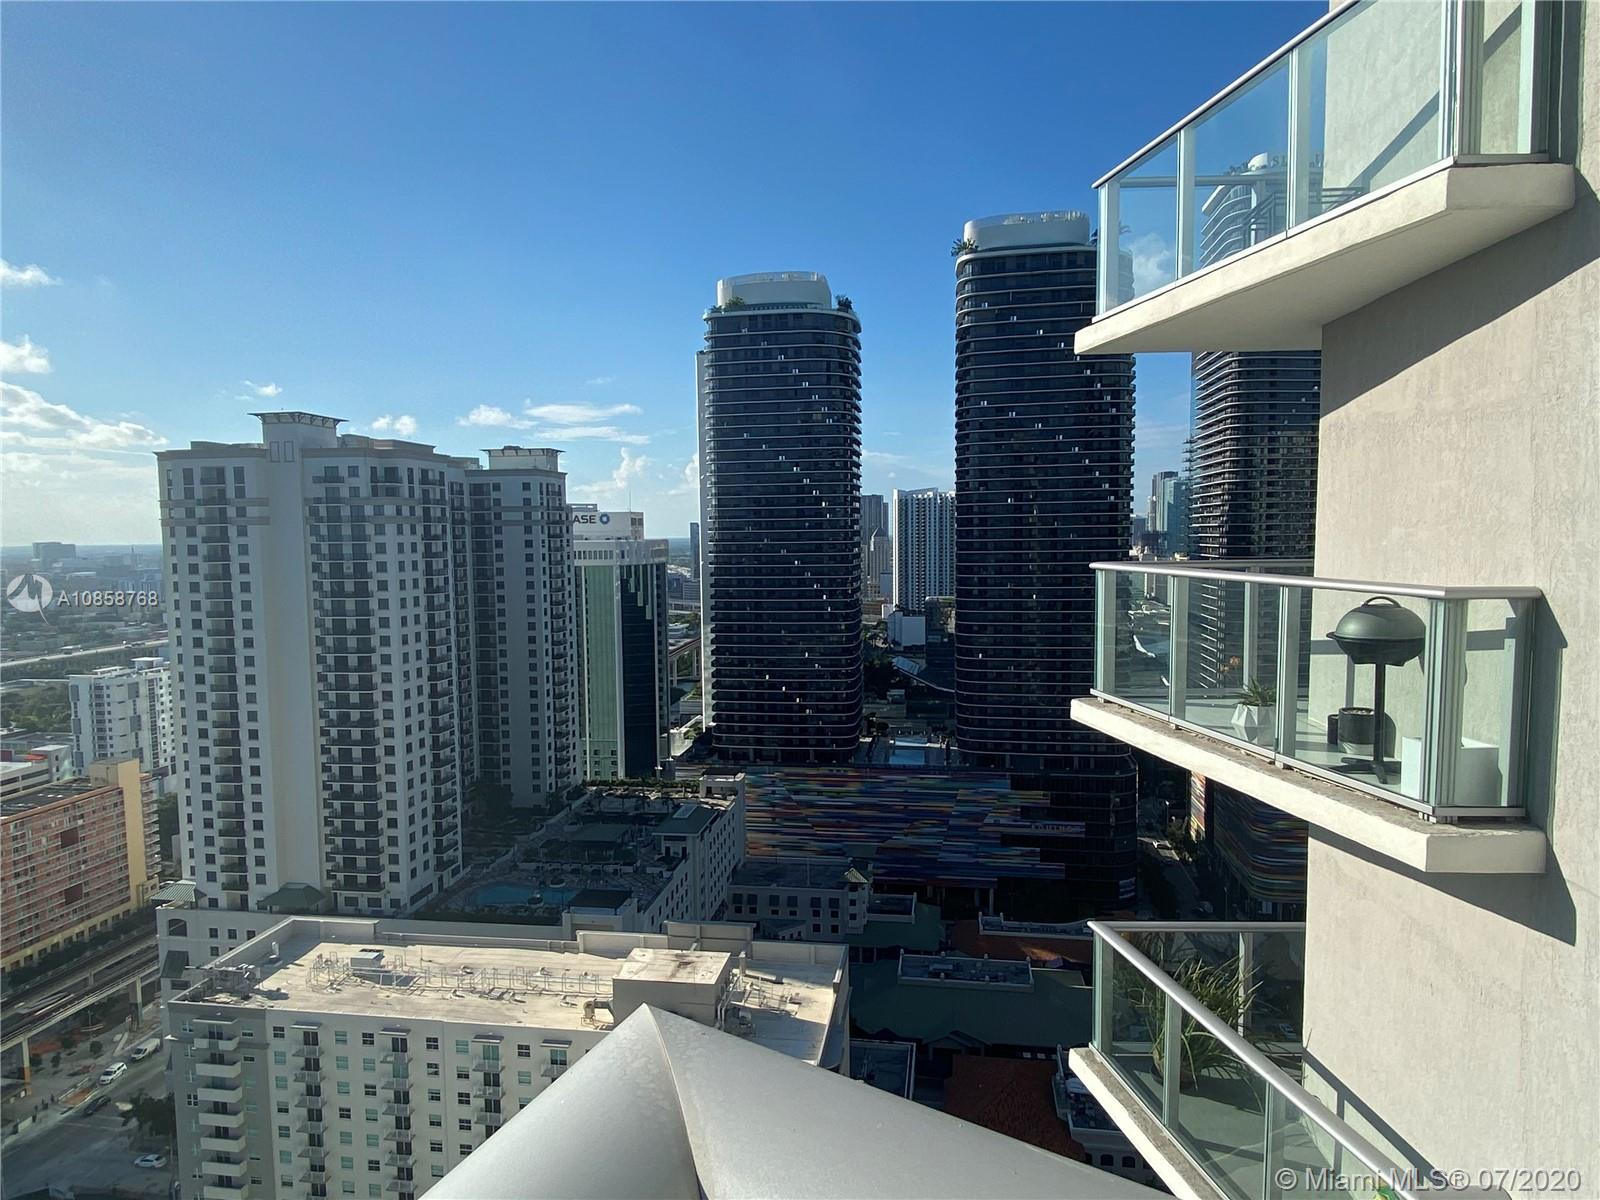 1100 Millecento #3106 - 1100 S MIAMI AV #3106, Miami, FL 33130